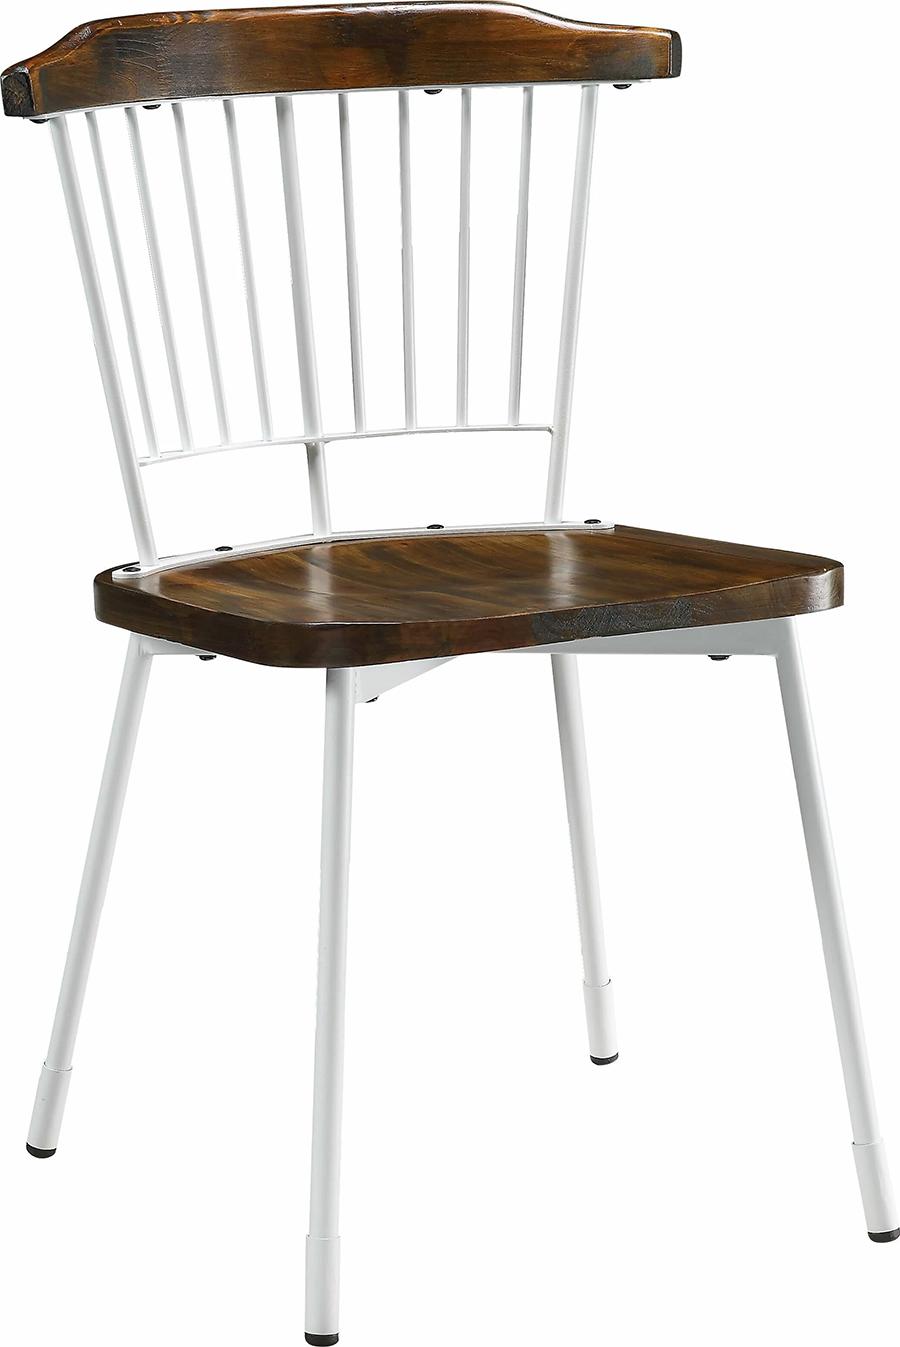 White & Brown Oak Side Chair Angle